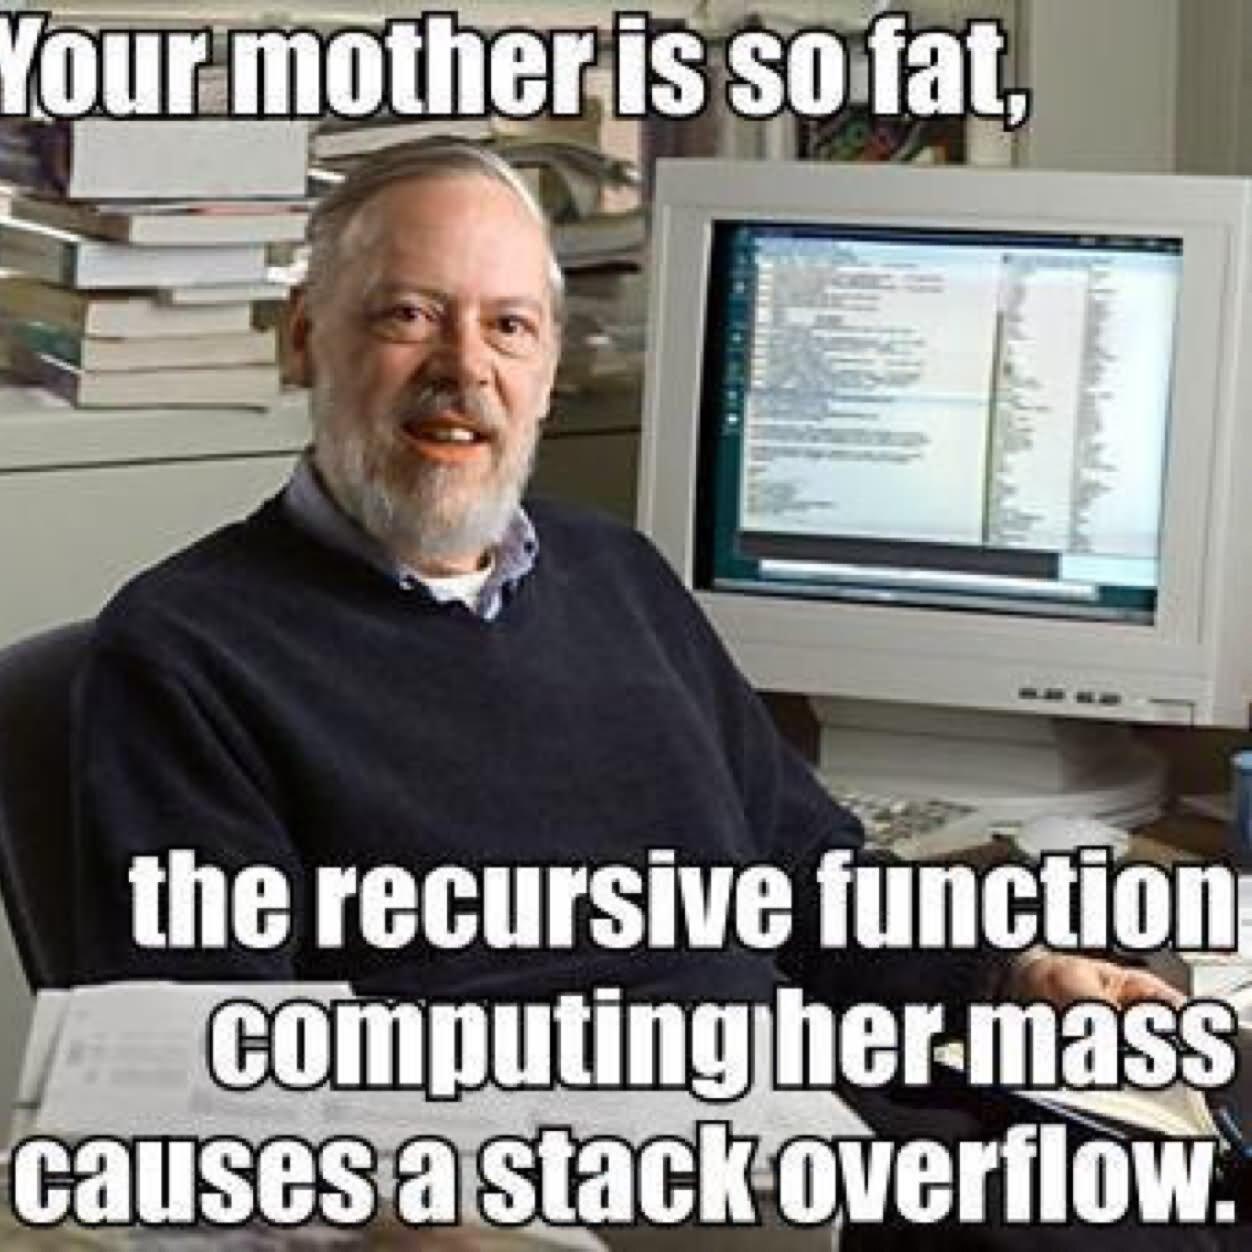 amusing computer memes